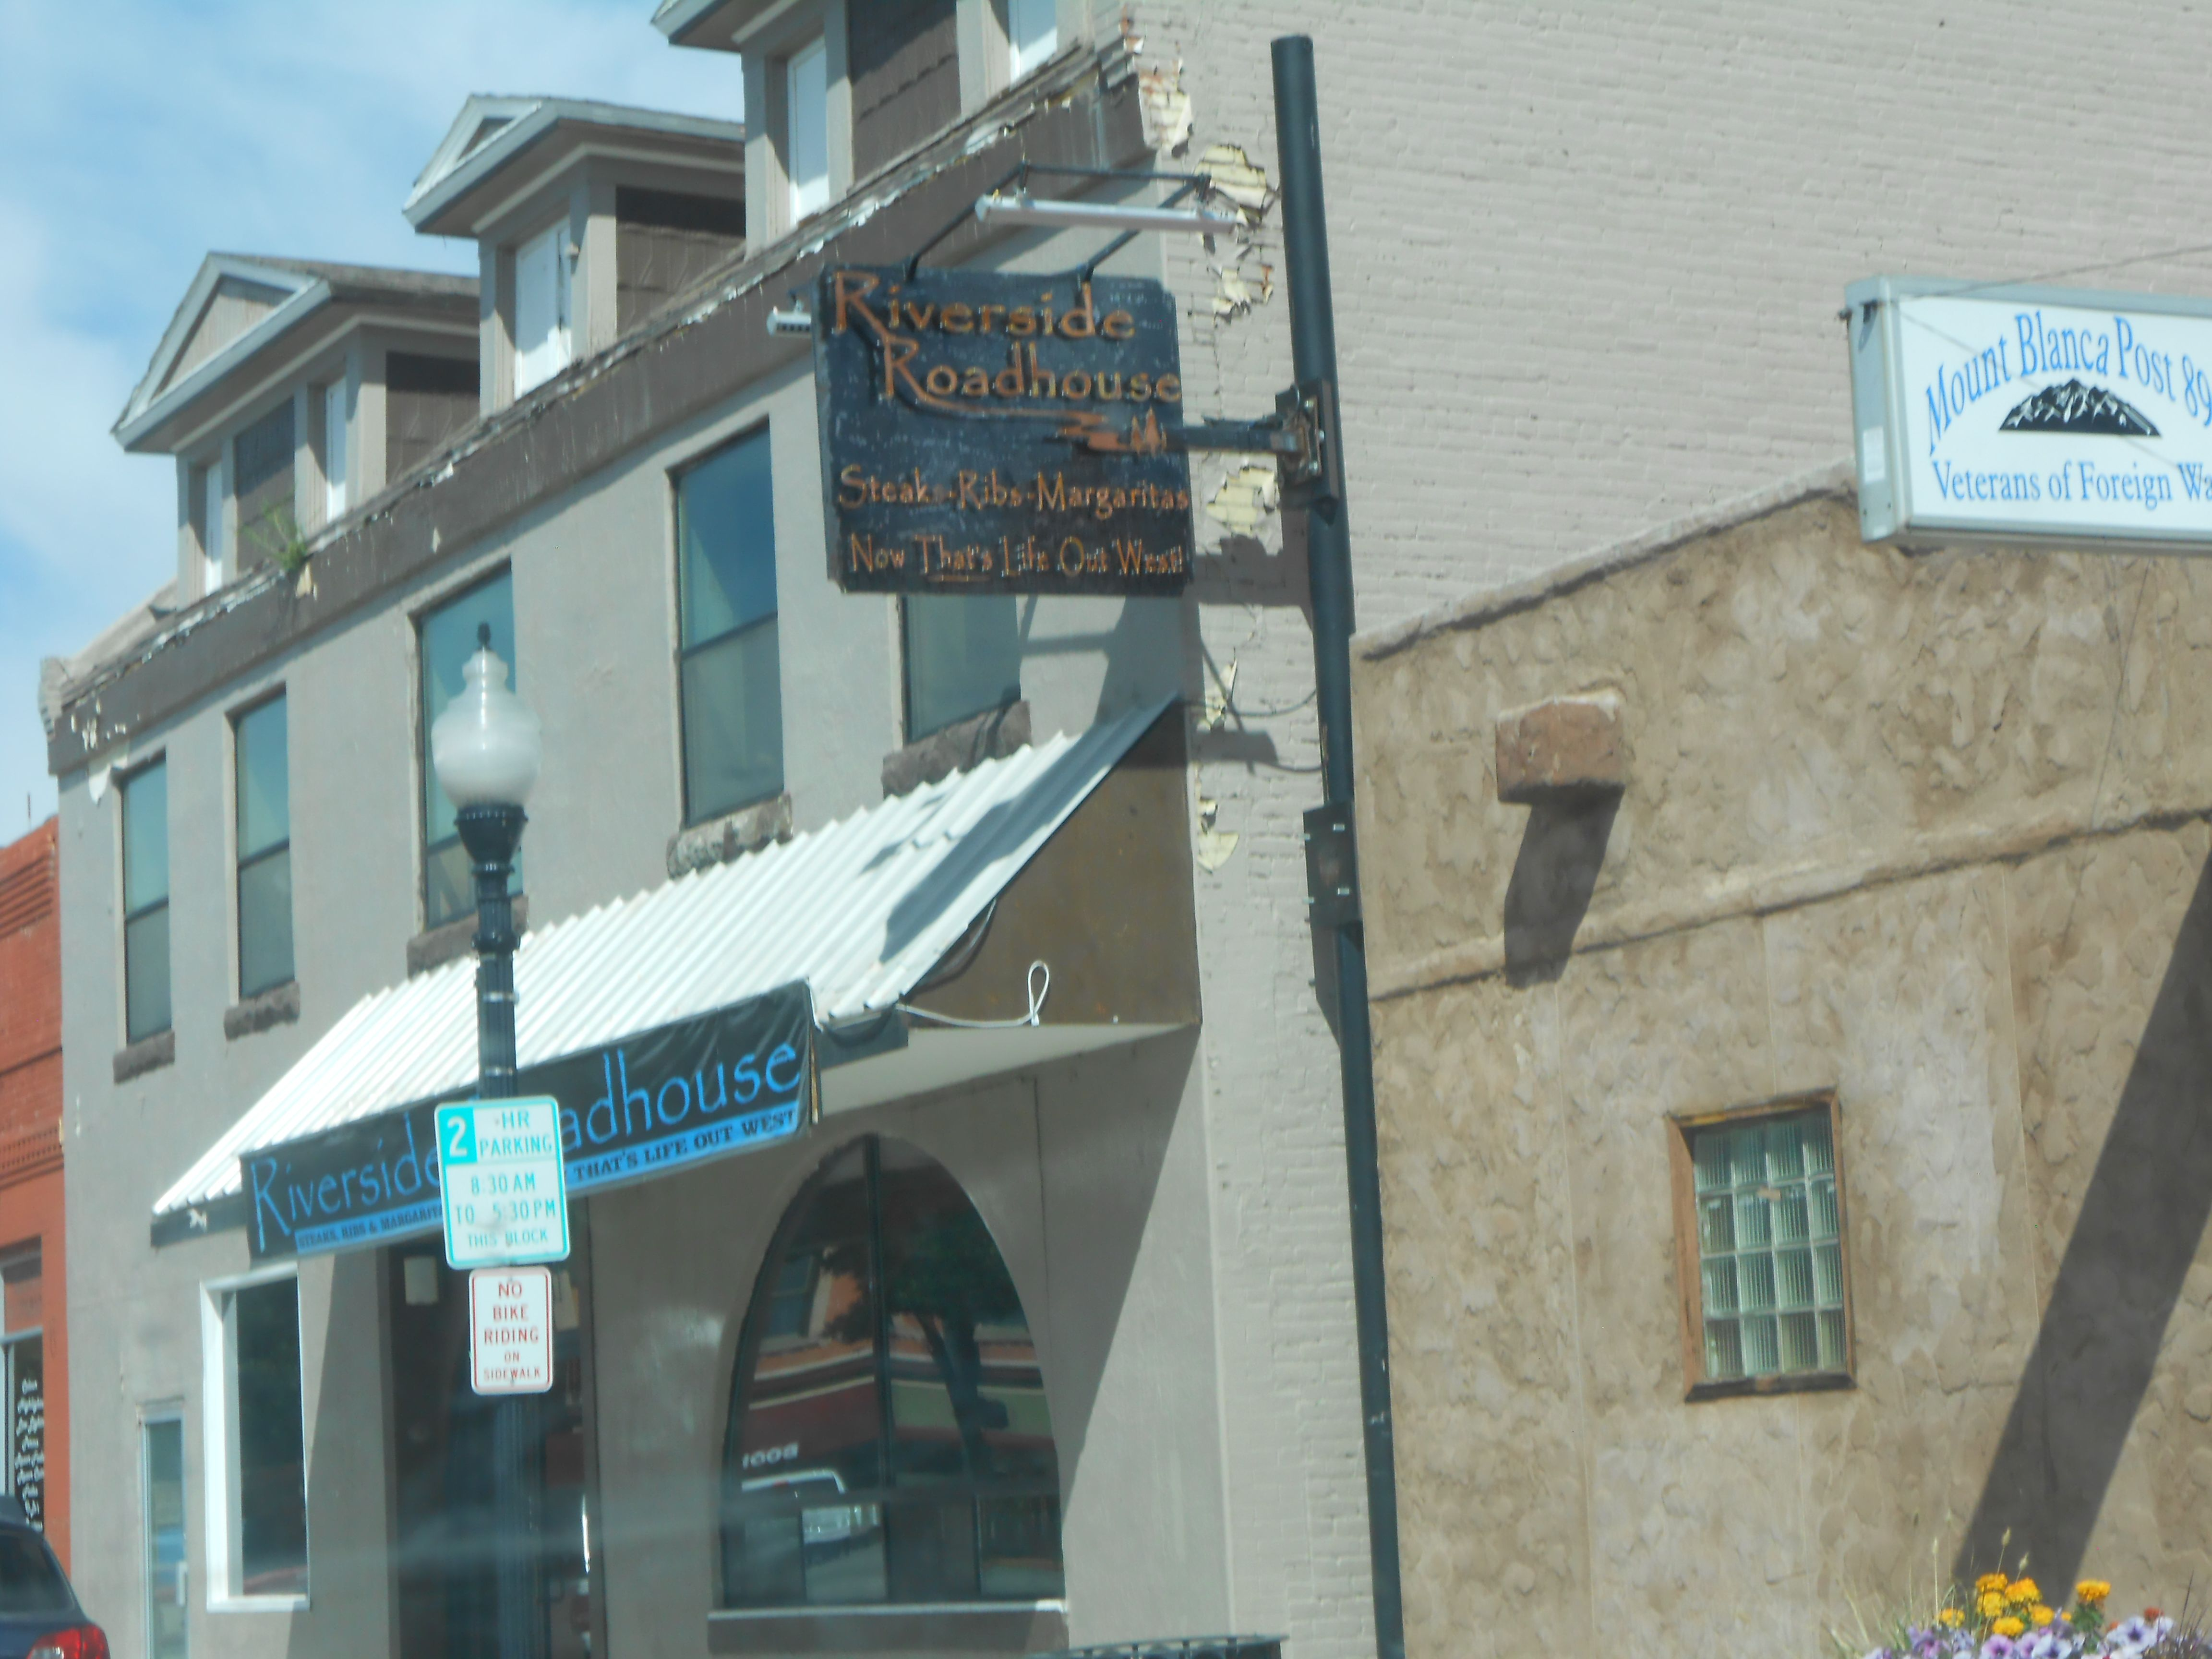 Riverside Roadhouse 525 Main Street Alamosa Co 81101 719 589 6641